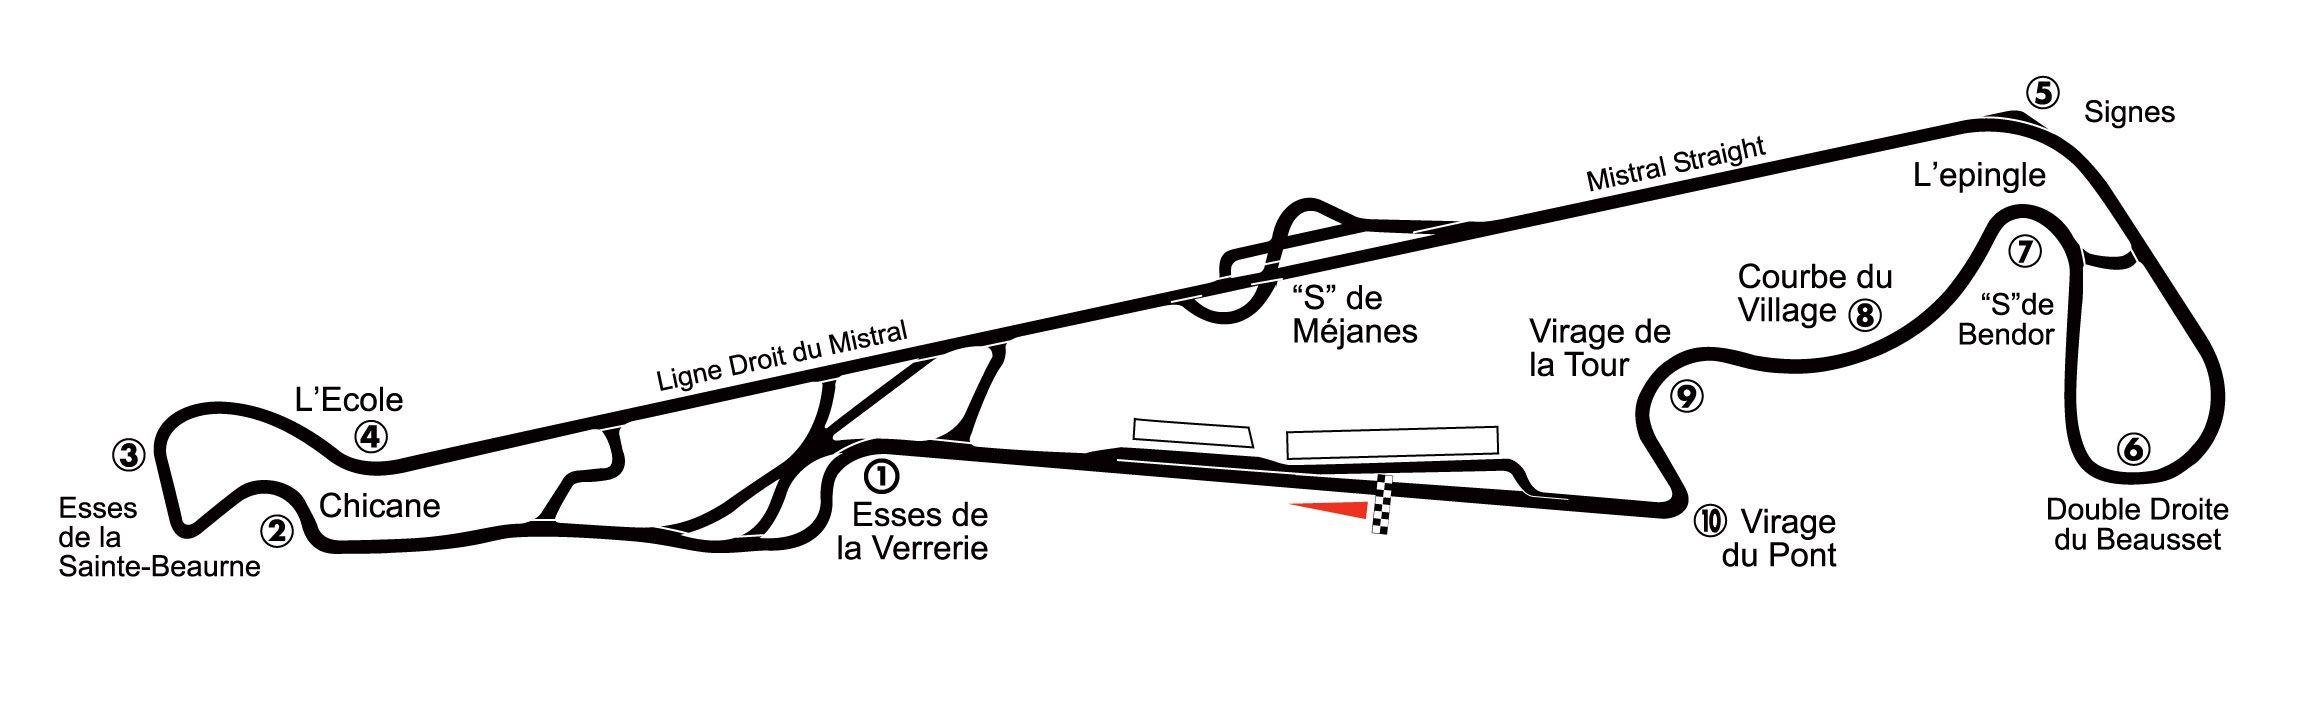 Paul Ricard Race Tracks Pinterest Race tracks and F1